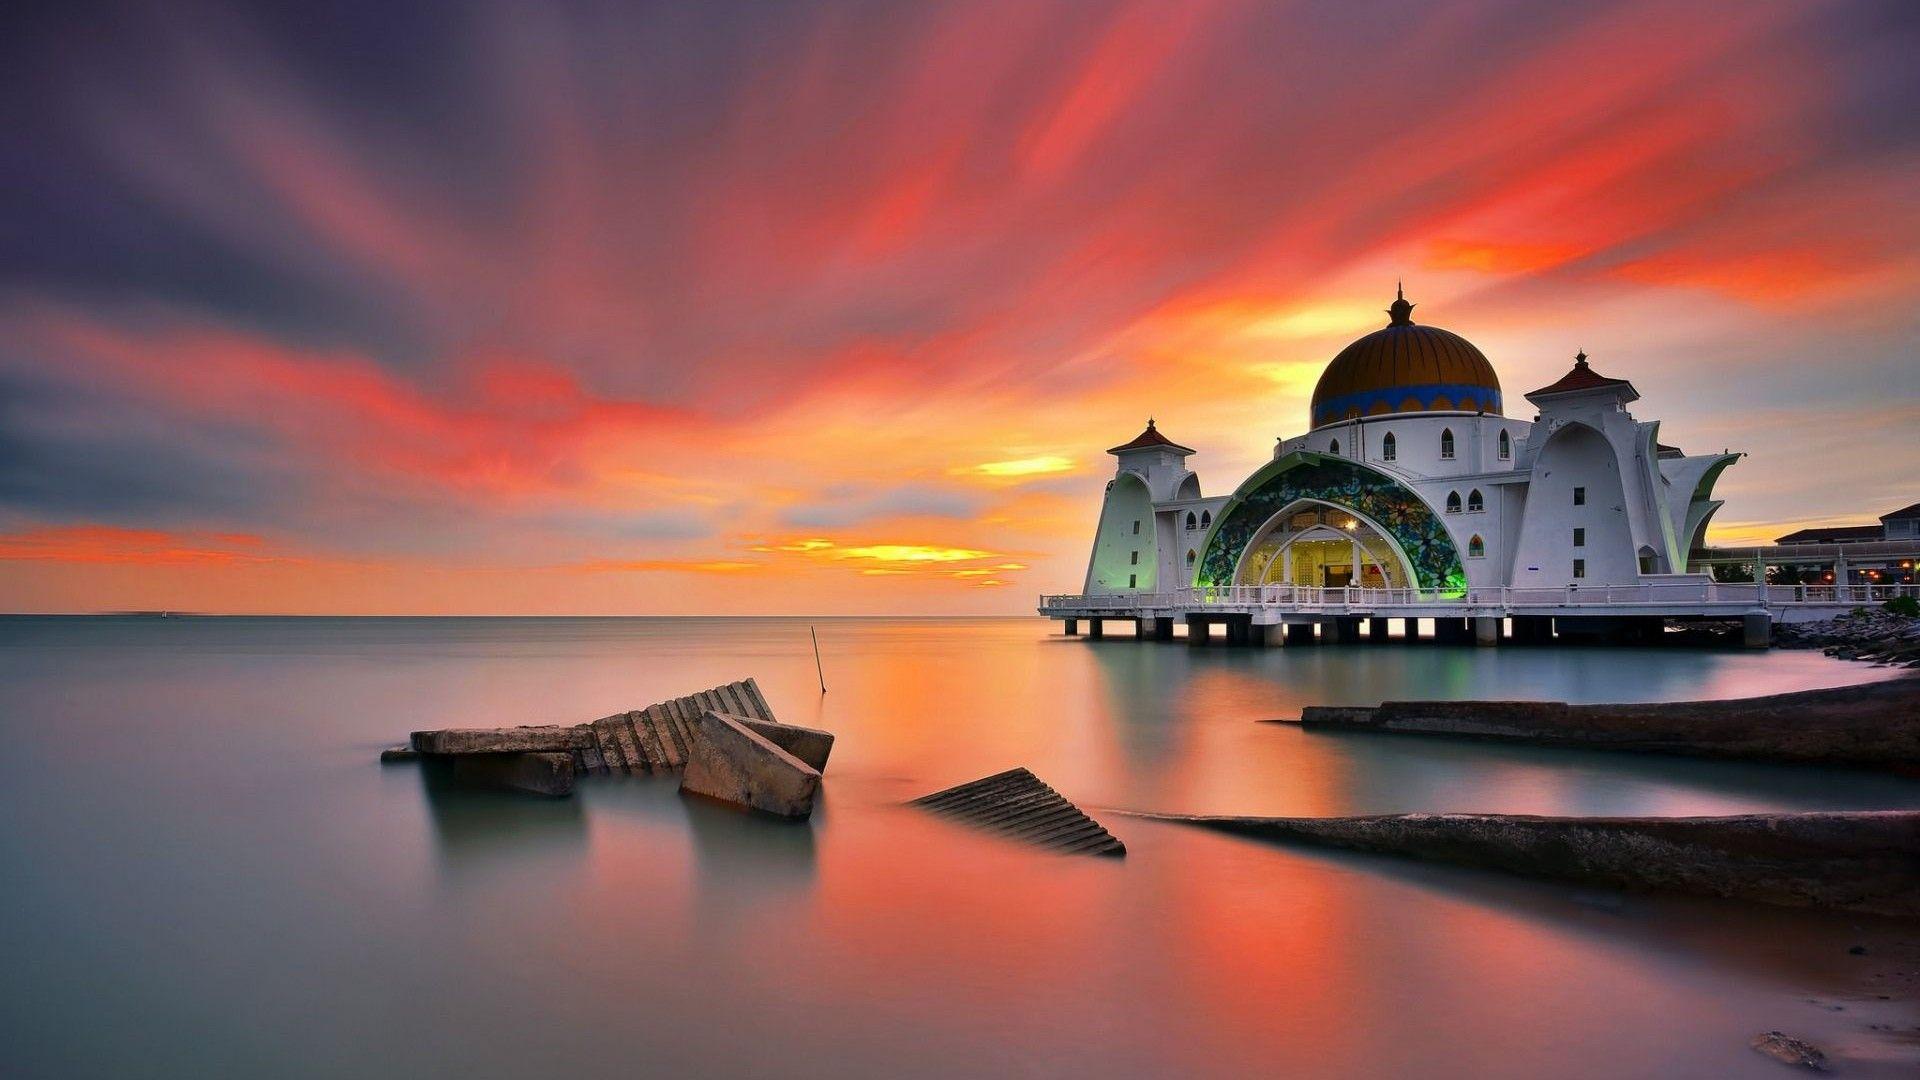 full HD Selat Melaka Mosque Malaysia Desktop wallpaper download free for Widescreen, Mobile ...